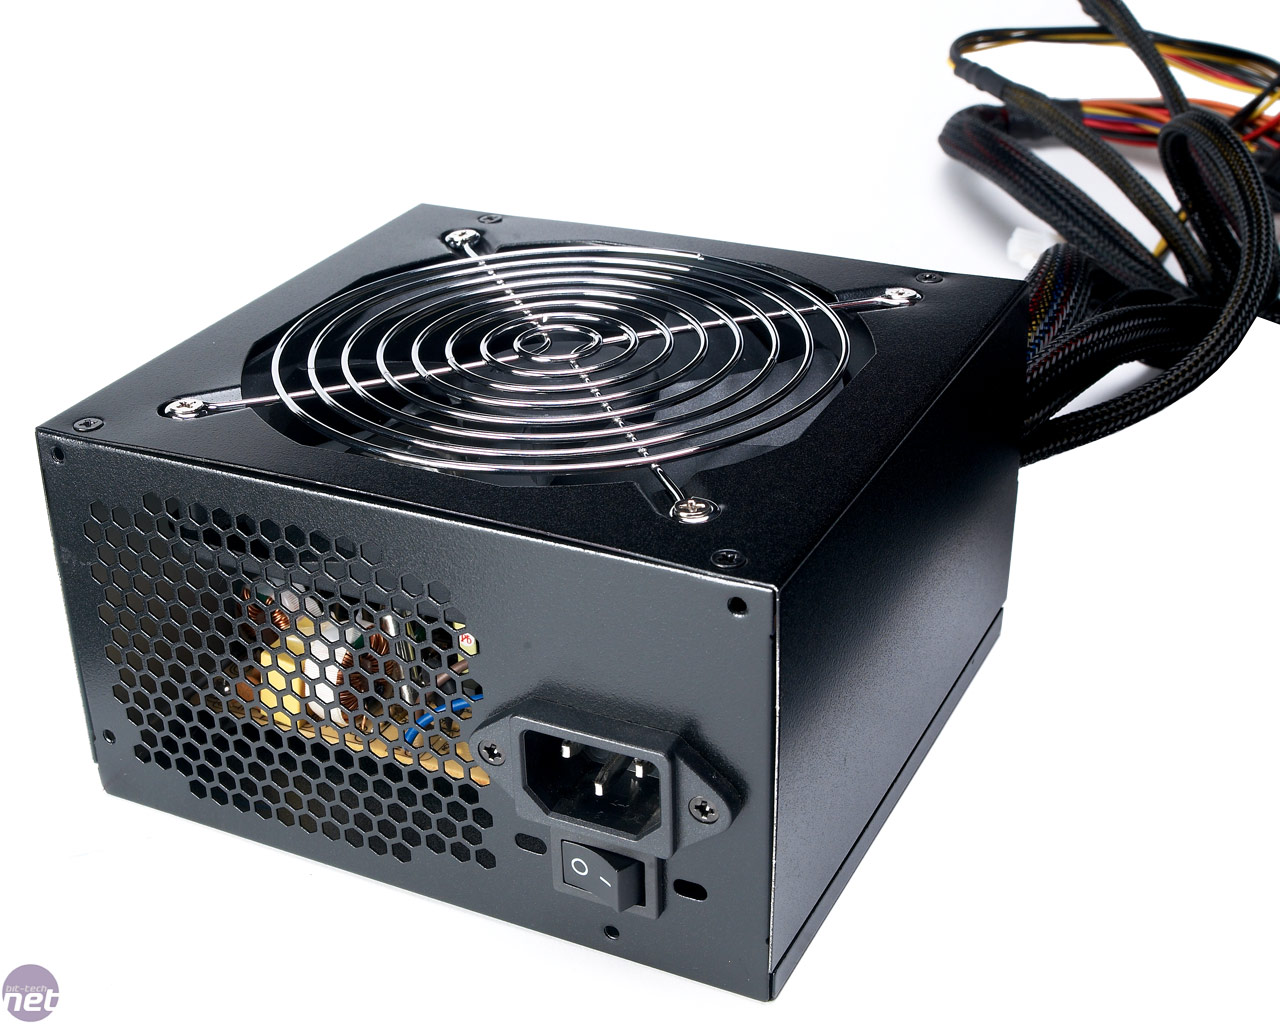 600 700w Psu Review Round Up Antec Atx12v Power Supply Tester Generic 600w